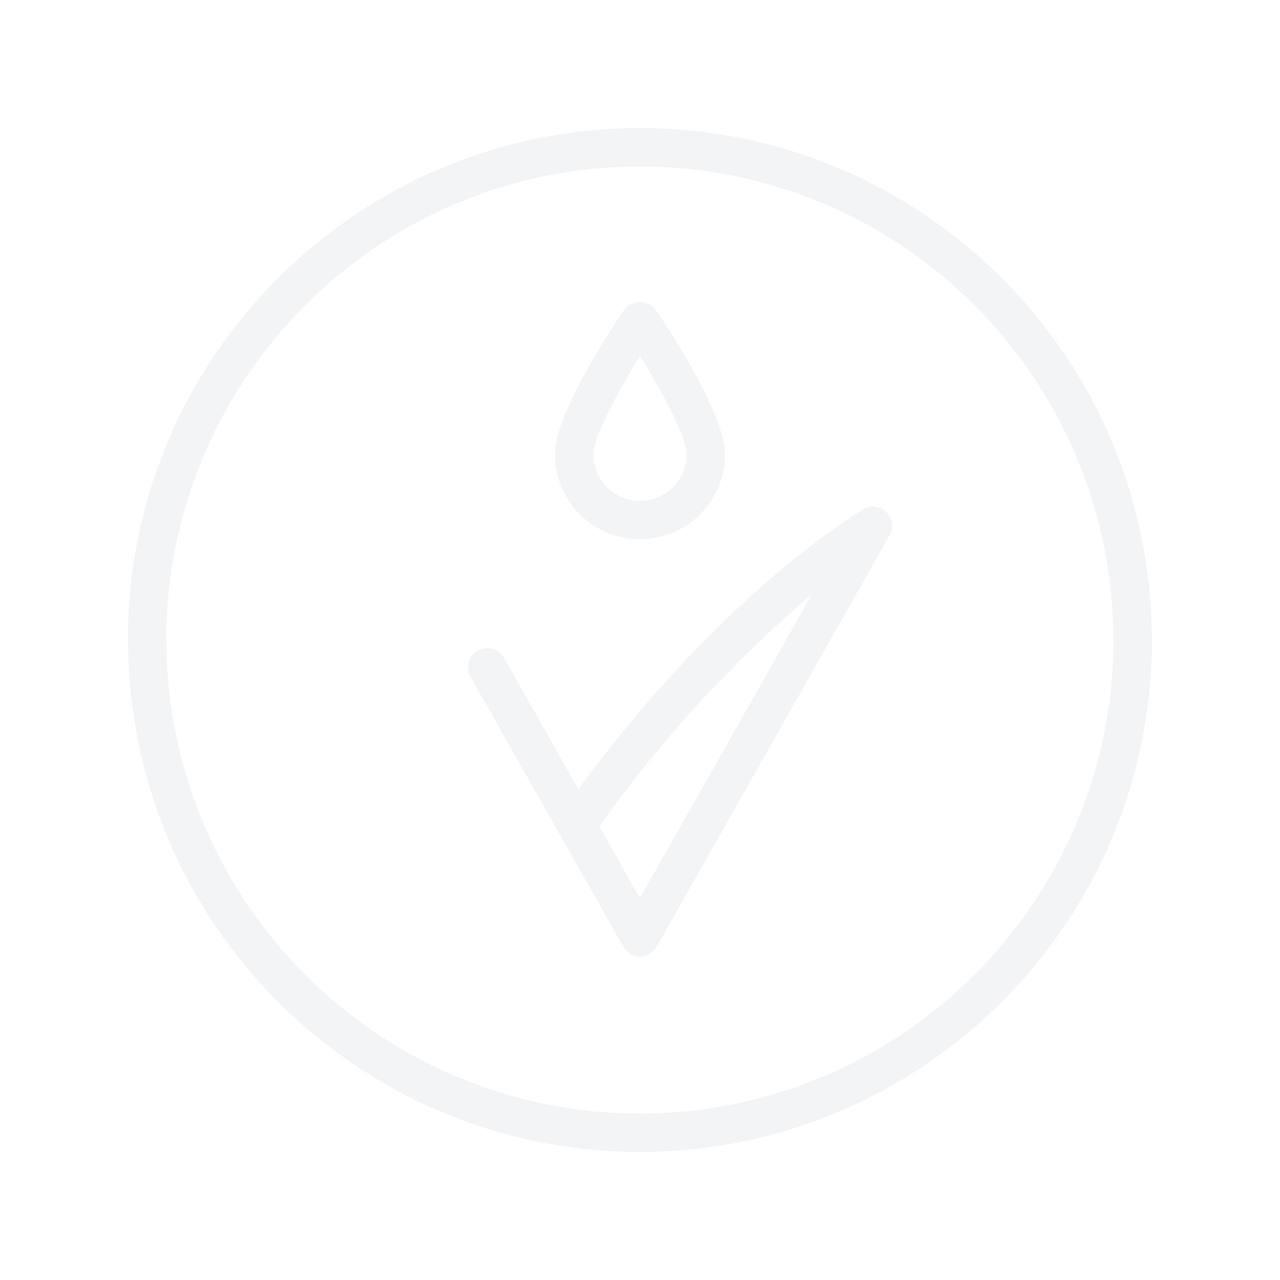 JOHN MASTERS ORGANICS Lavender & Rosemary Shampoo For Normal Hair 236ml